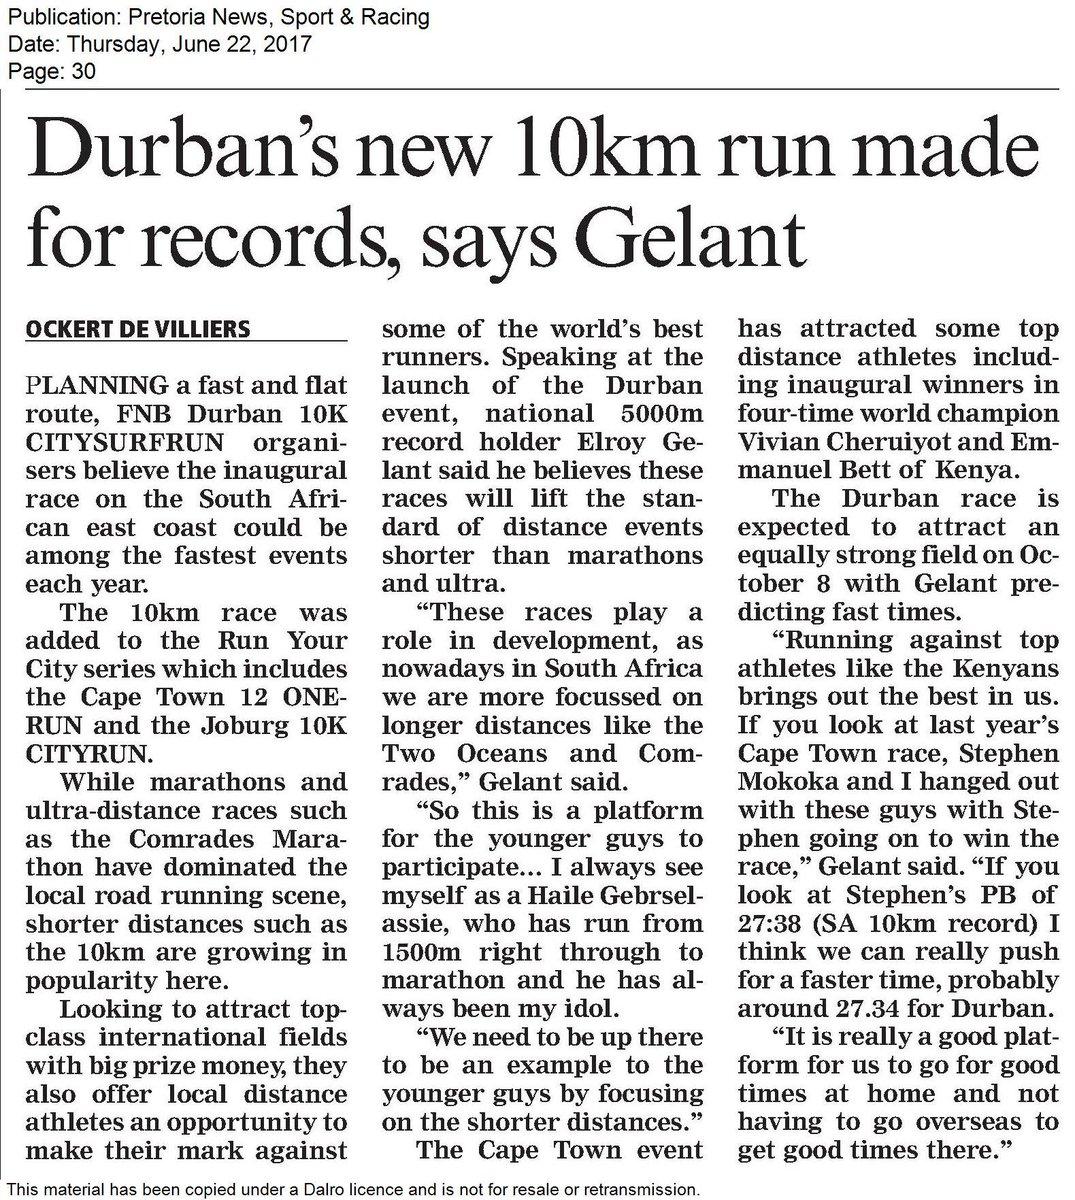 &quot;Durban&#39;s new 10km run made for records, says Gelant&quot; @PretoriaNews, 22 Jun 2017 #D10KRun #RunThe031 #Press #Media<br>http://pic.twitter.com/VPnuYRmbl0